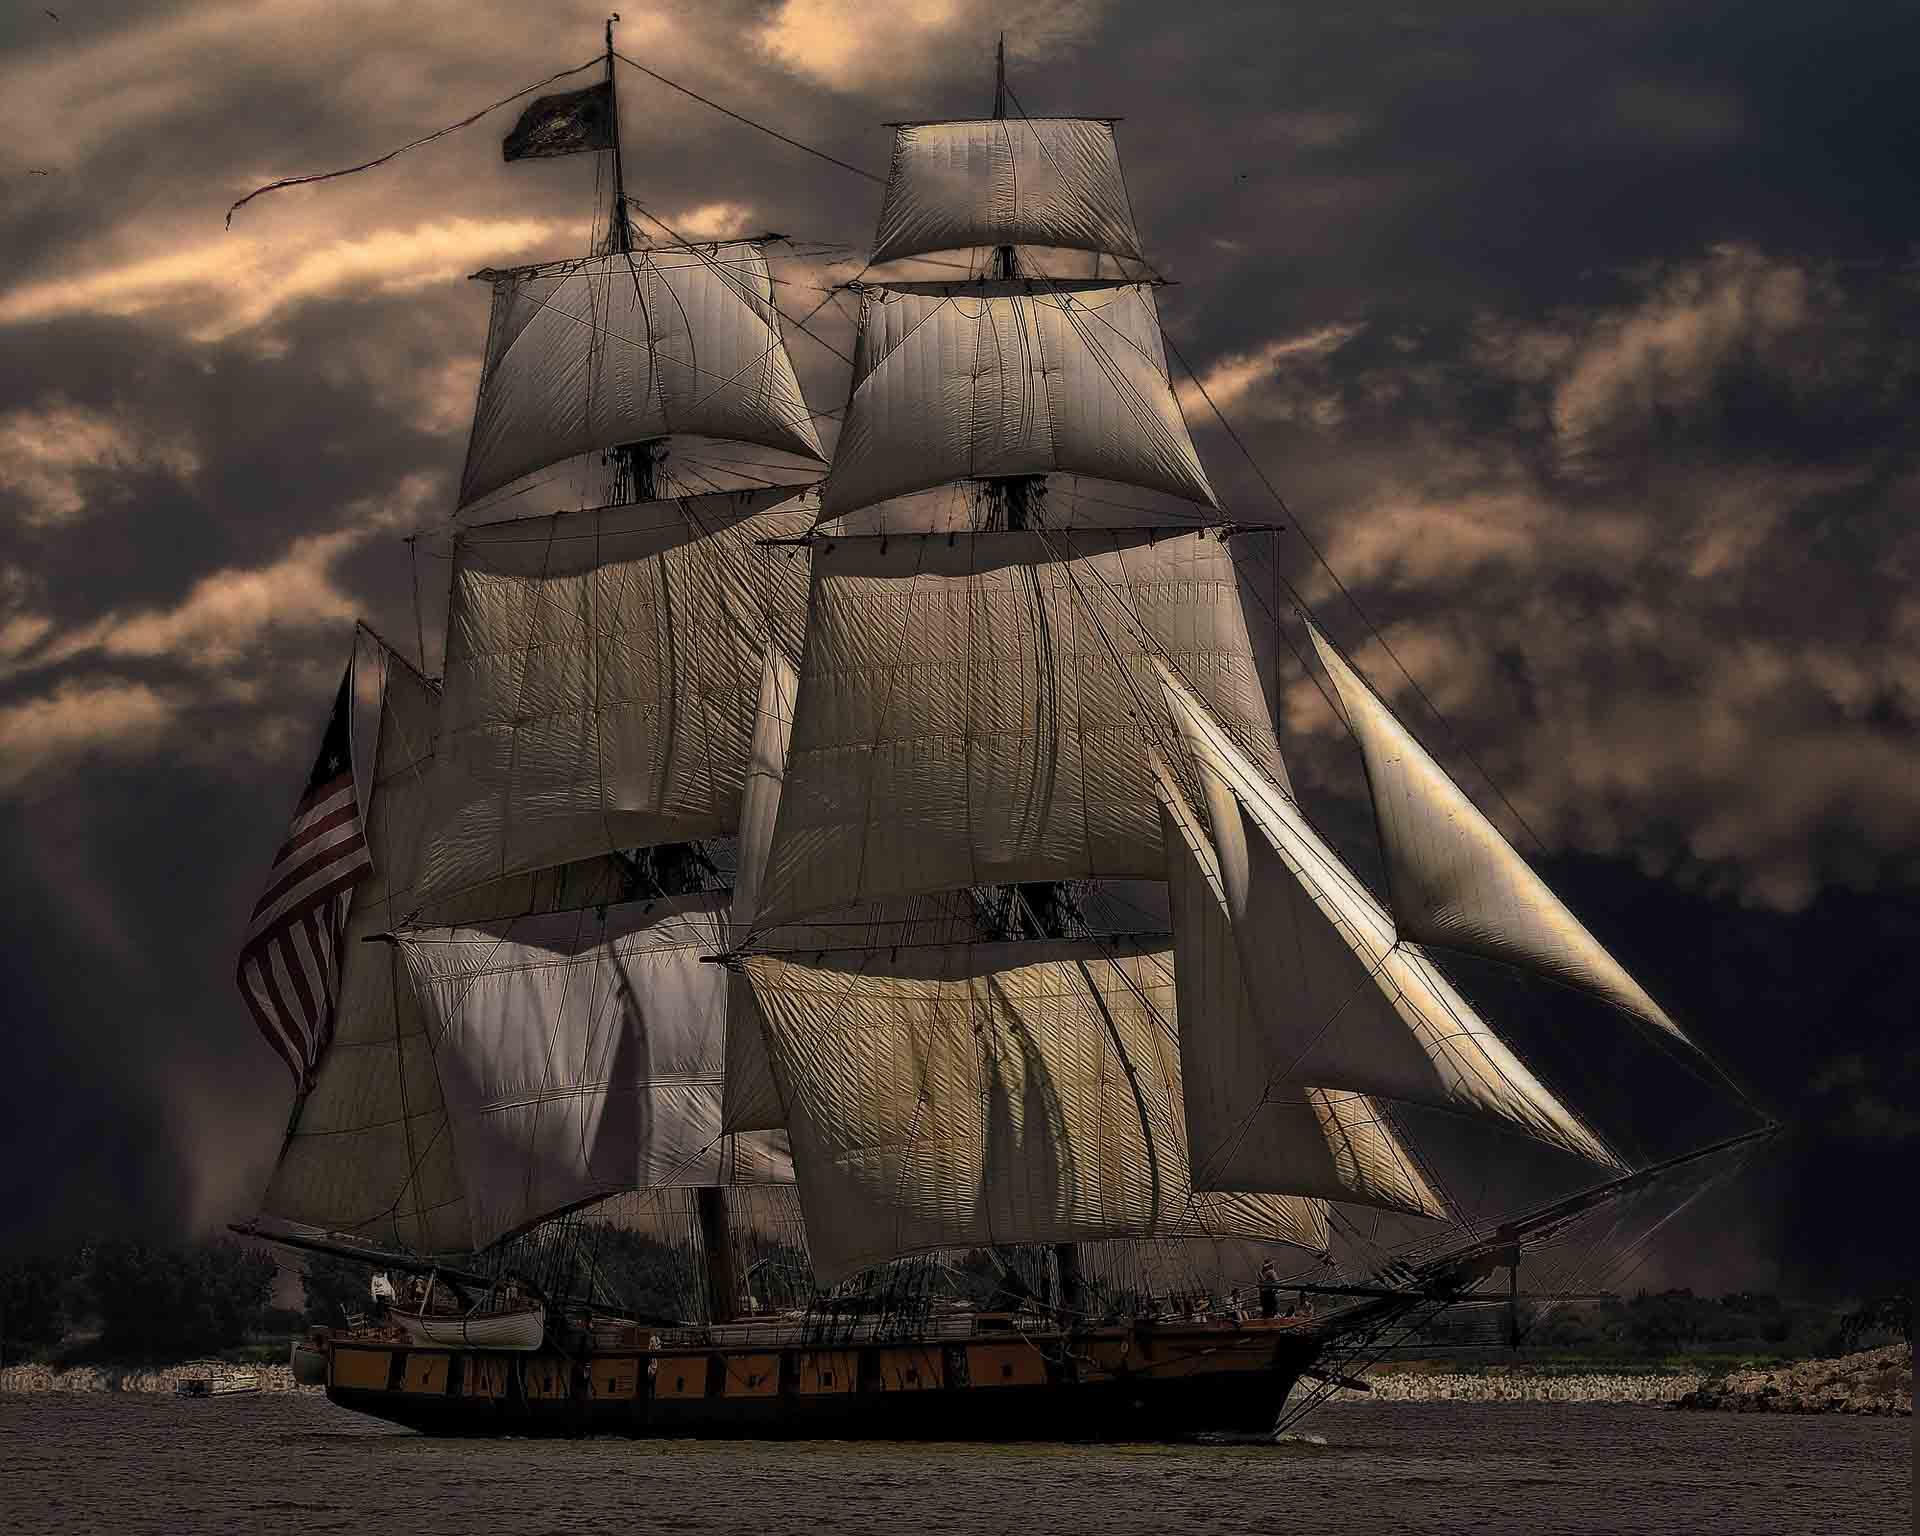 lezioni di navigazione Trieste